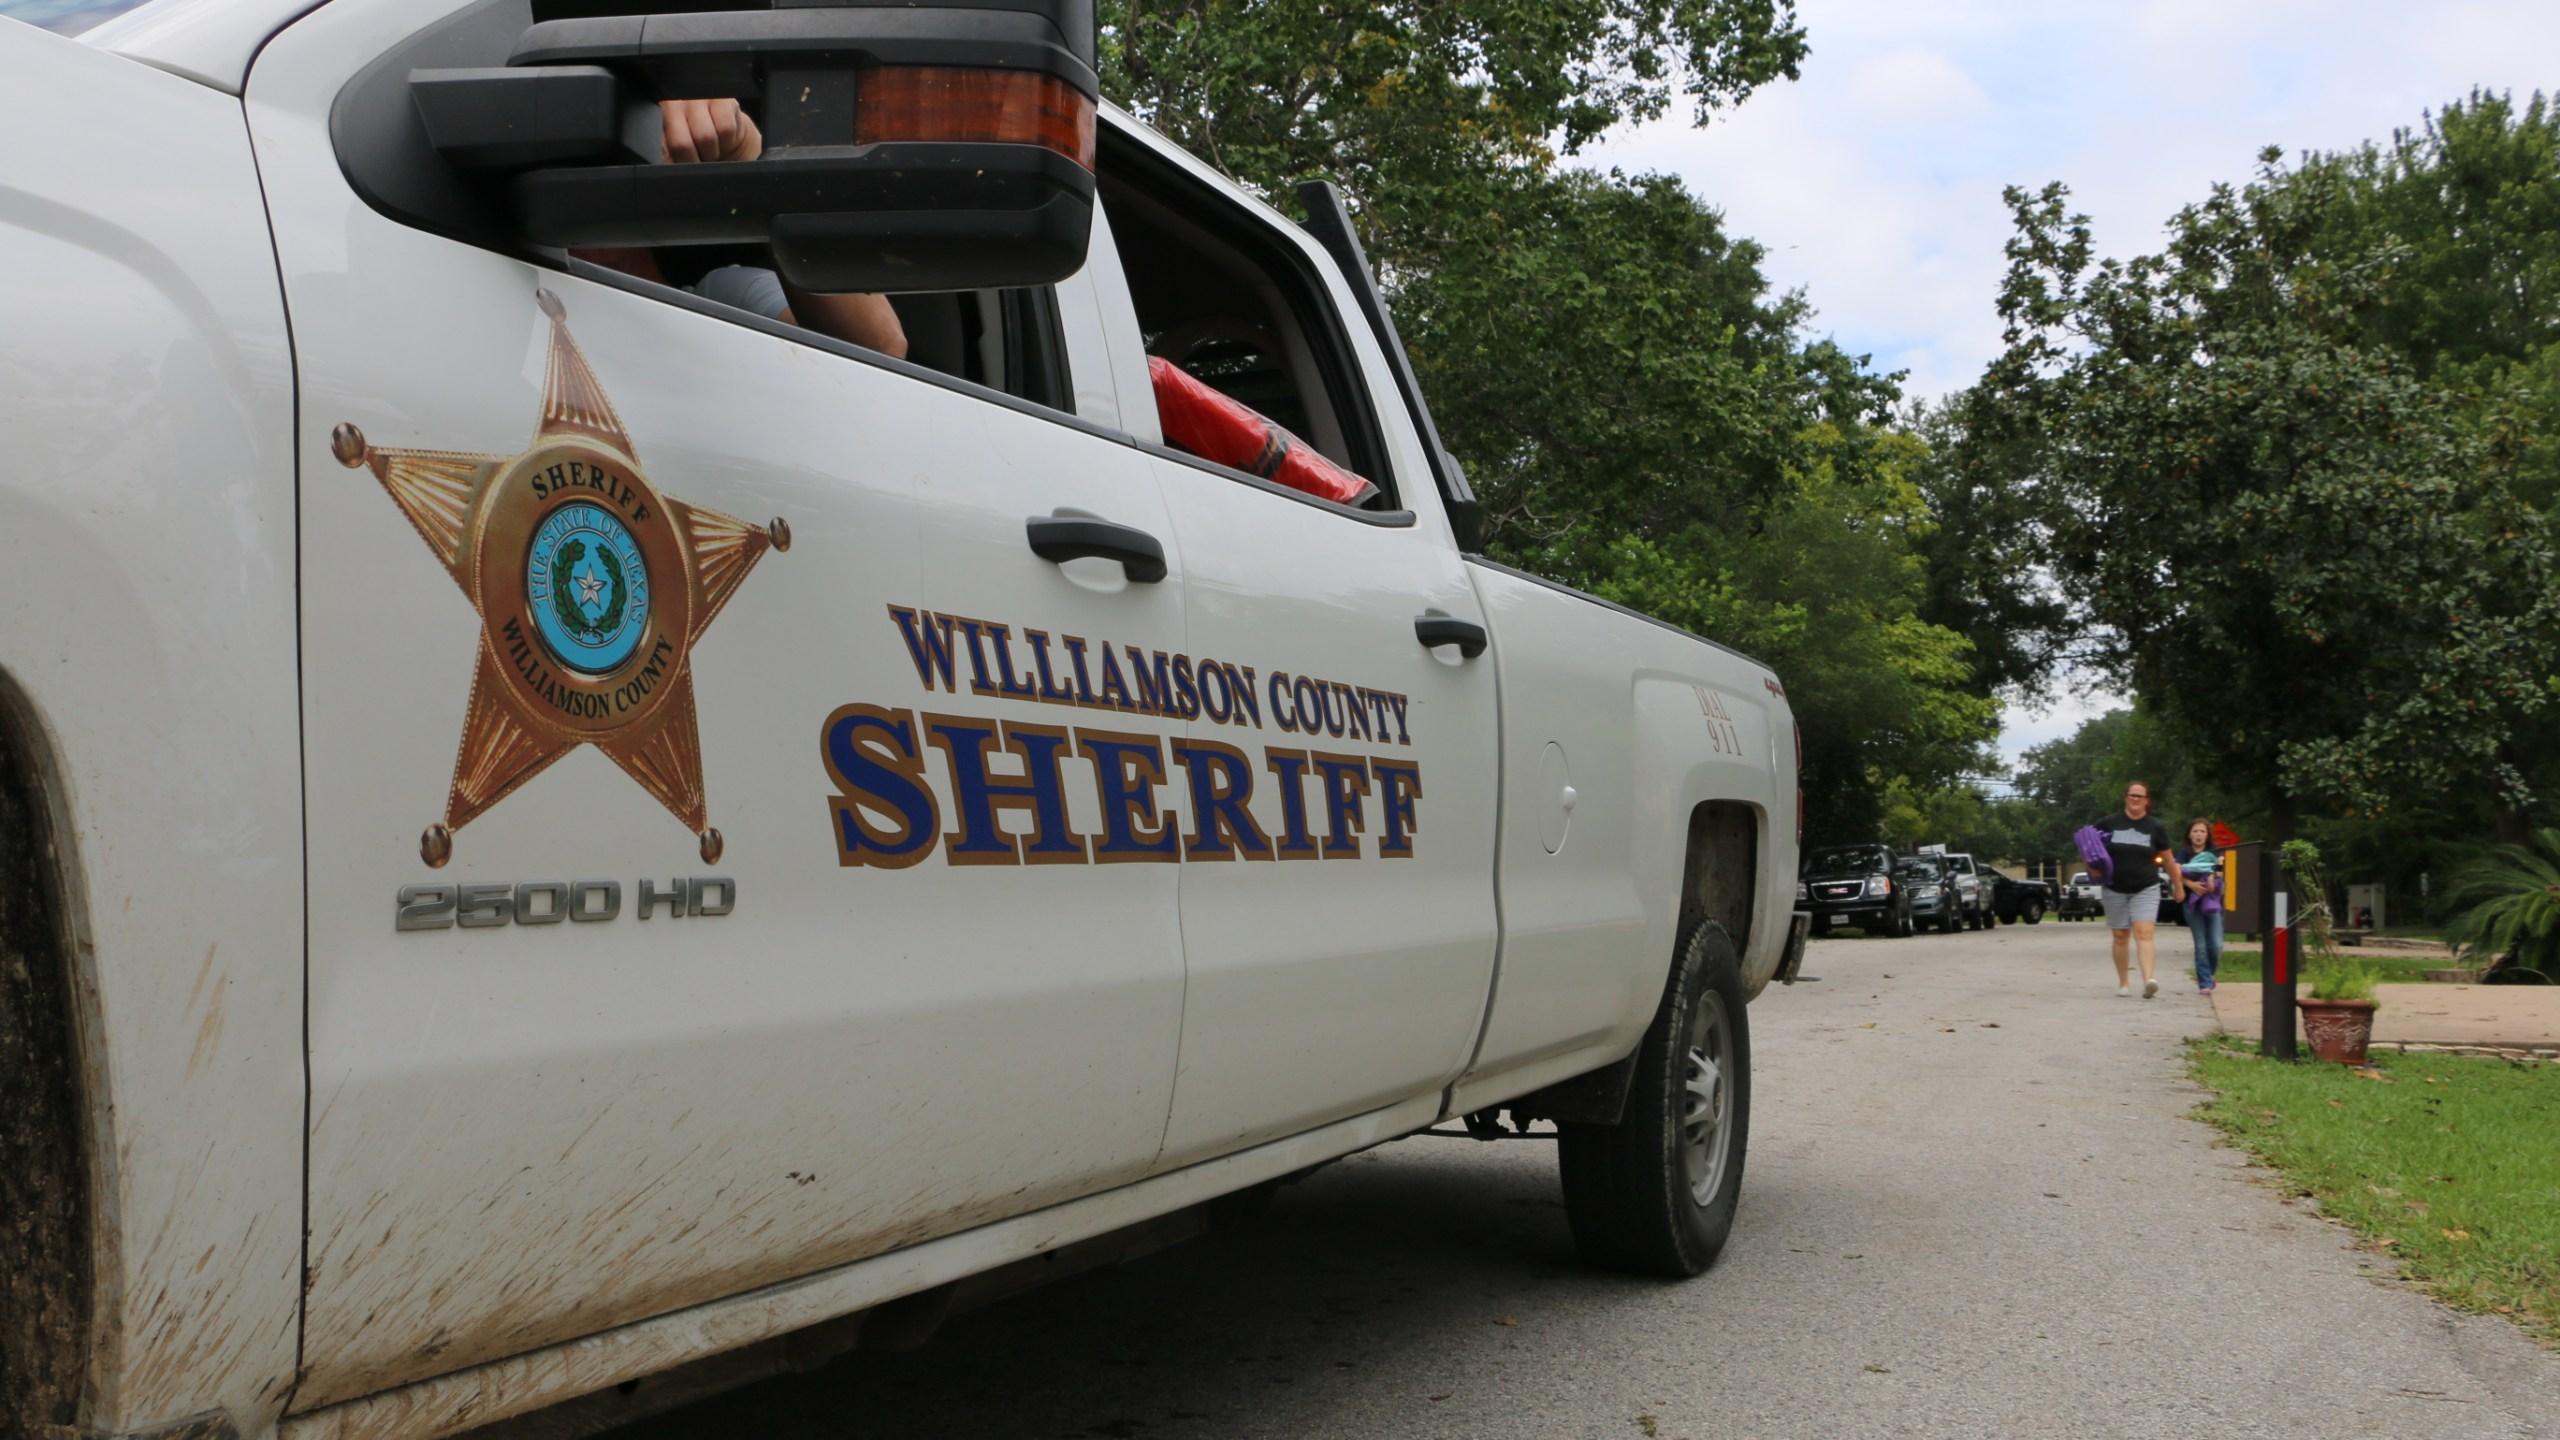 williamson county sheriff harvey_536300